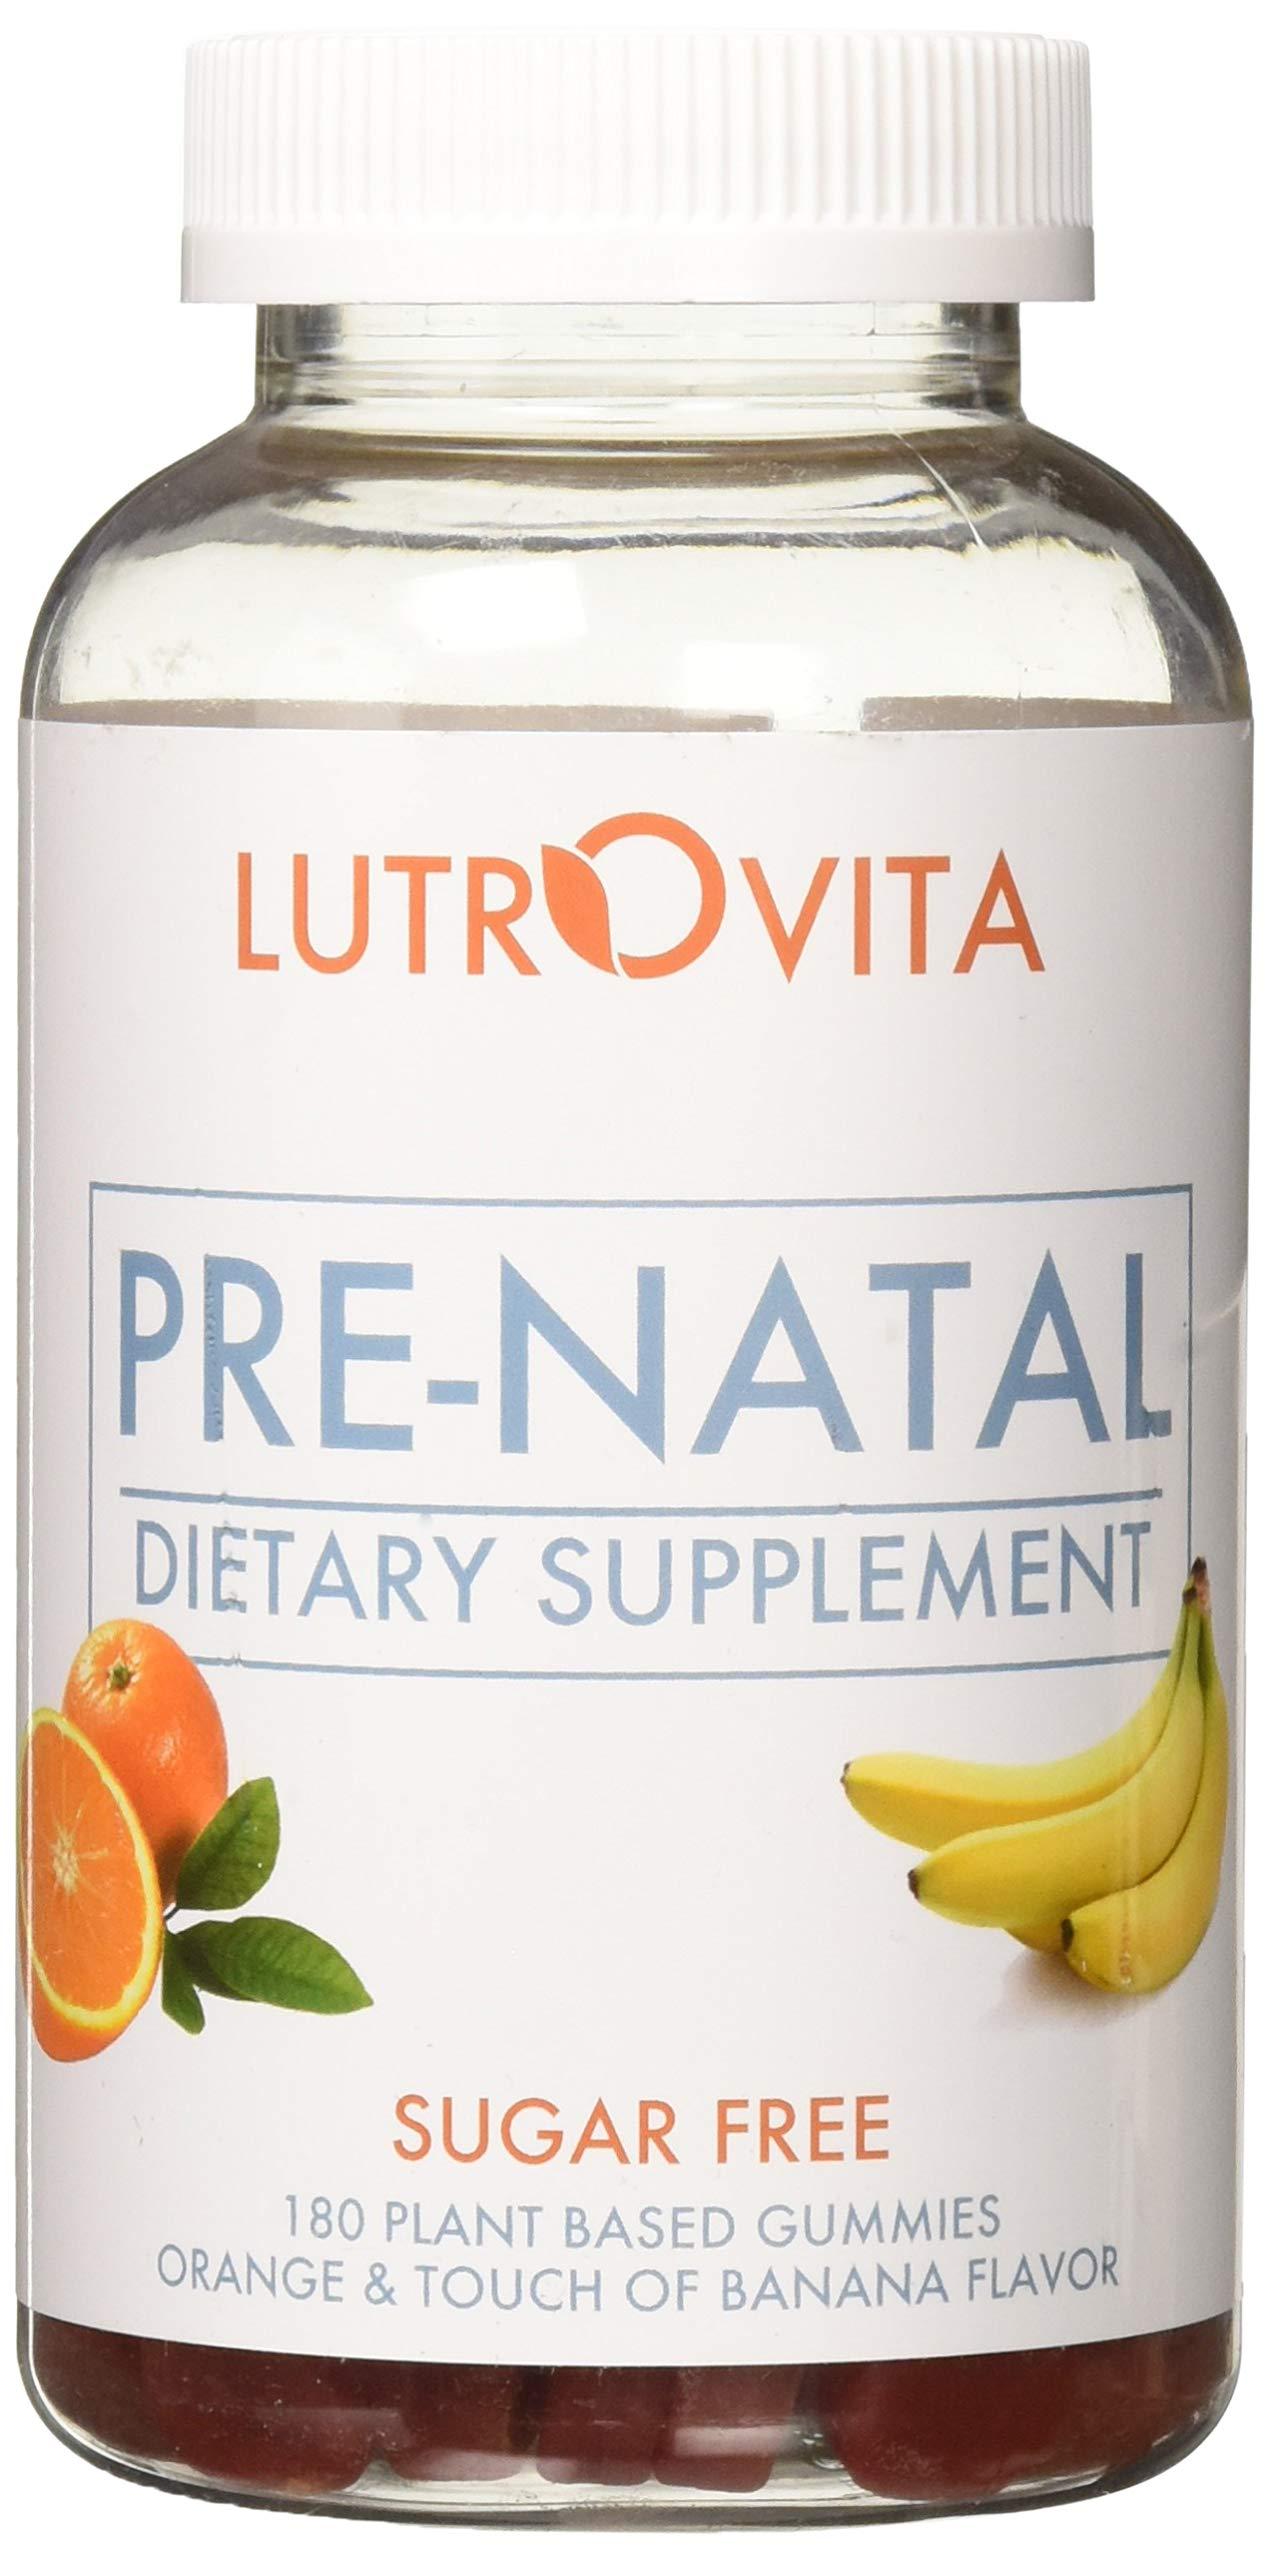 Lutrovita Sugar Free Pre-Natal Orange & Touch of Banana, 180 Count